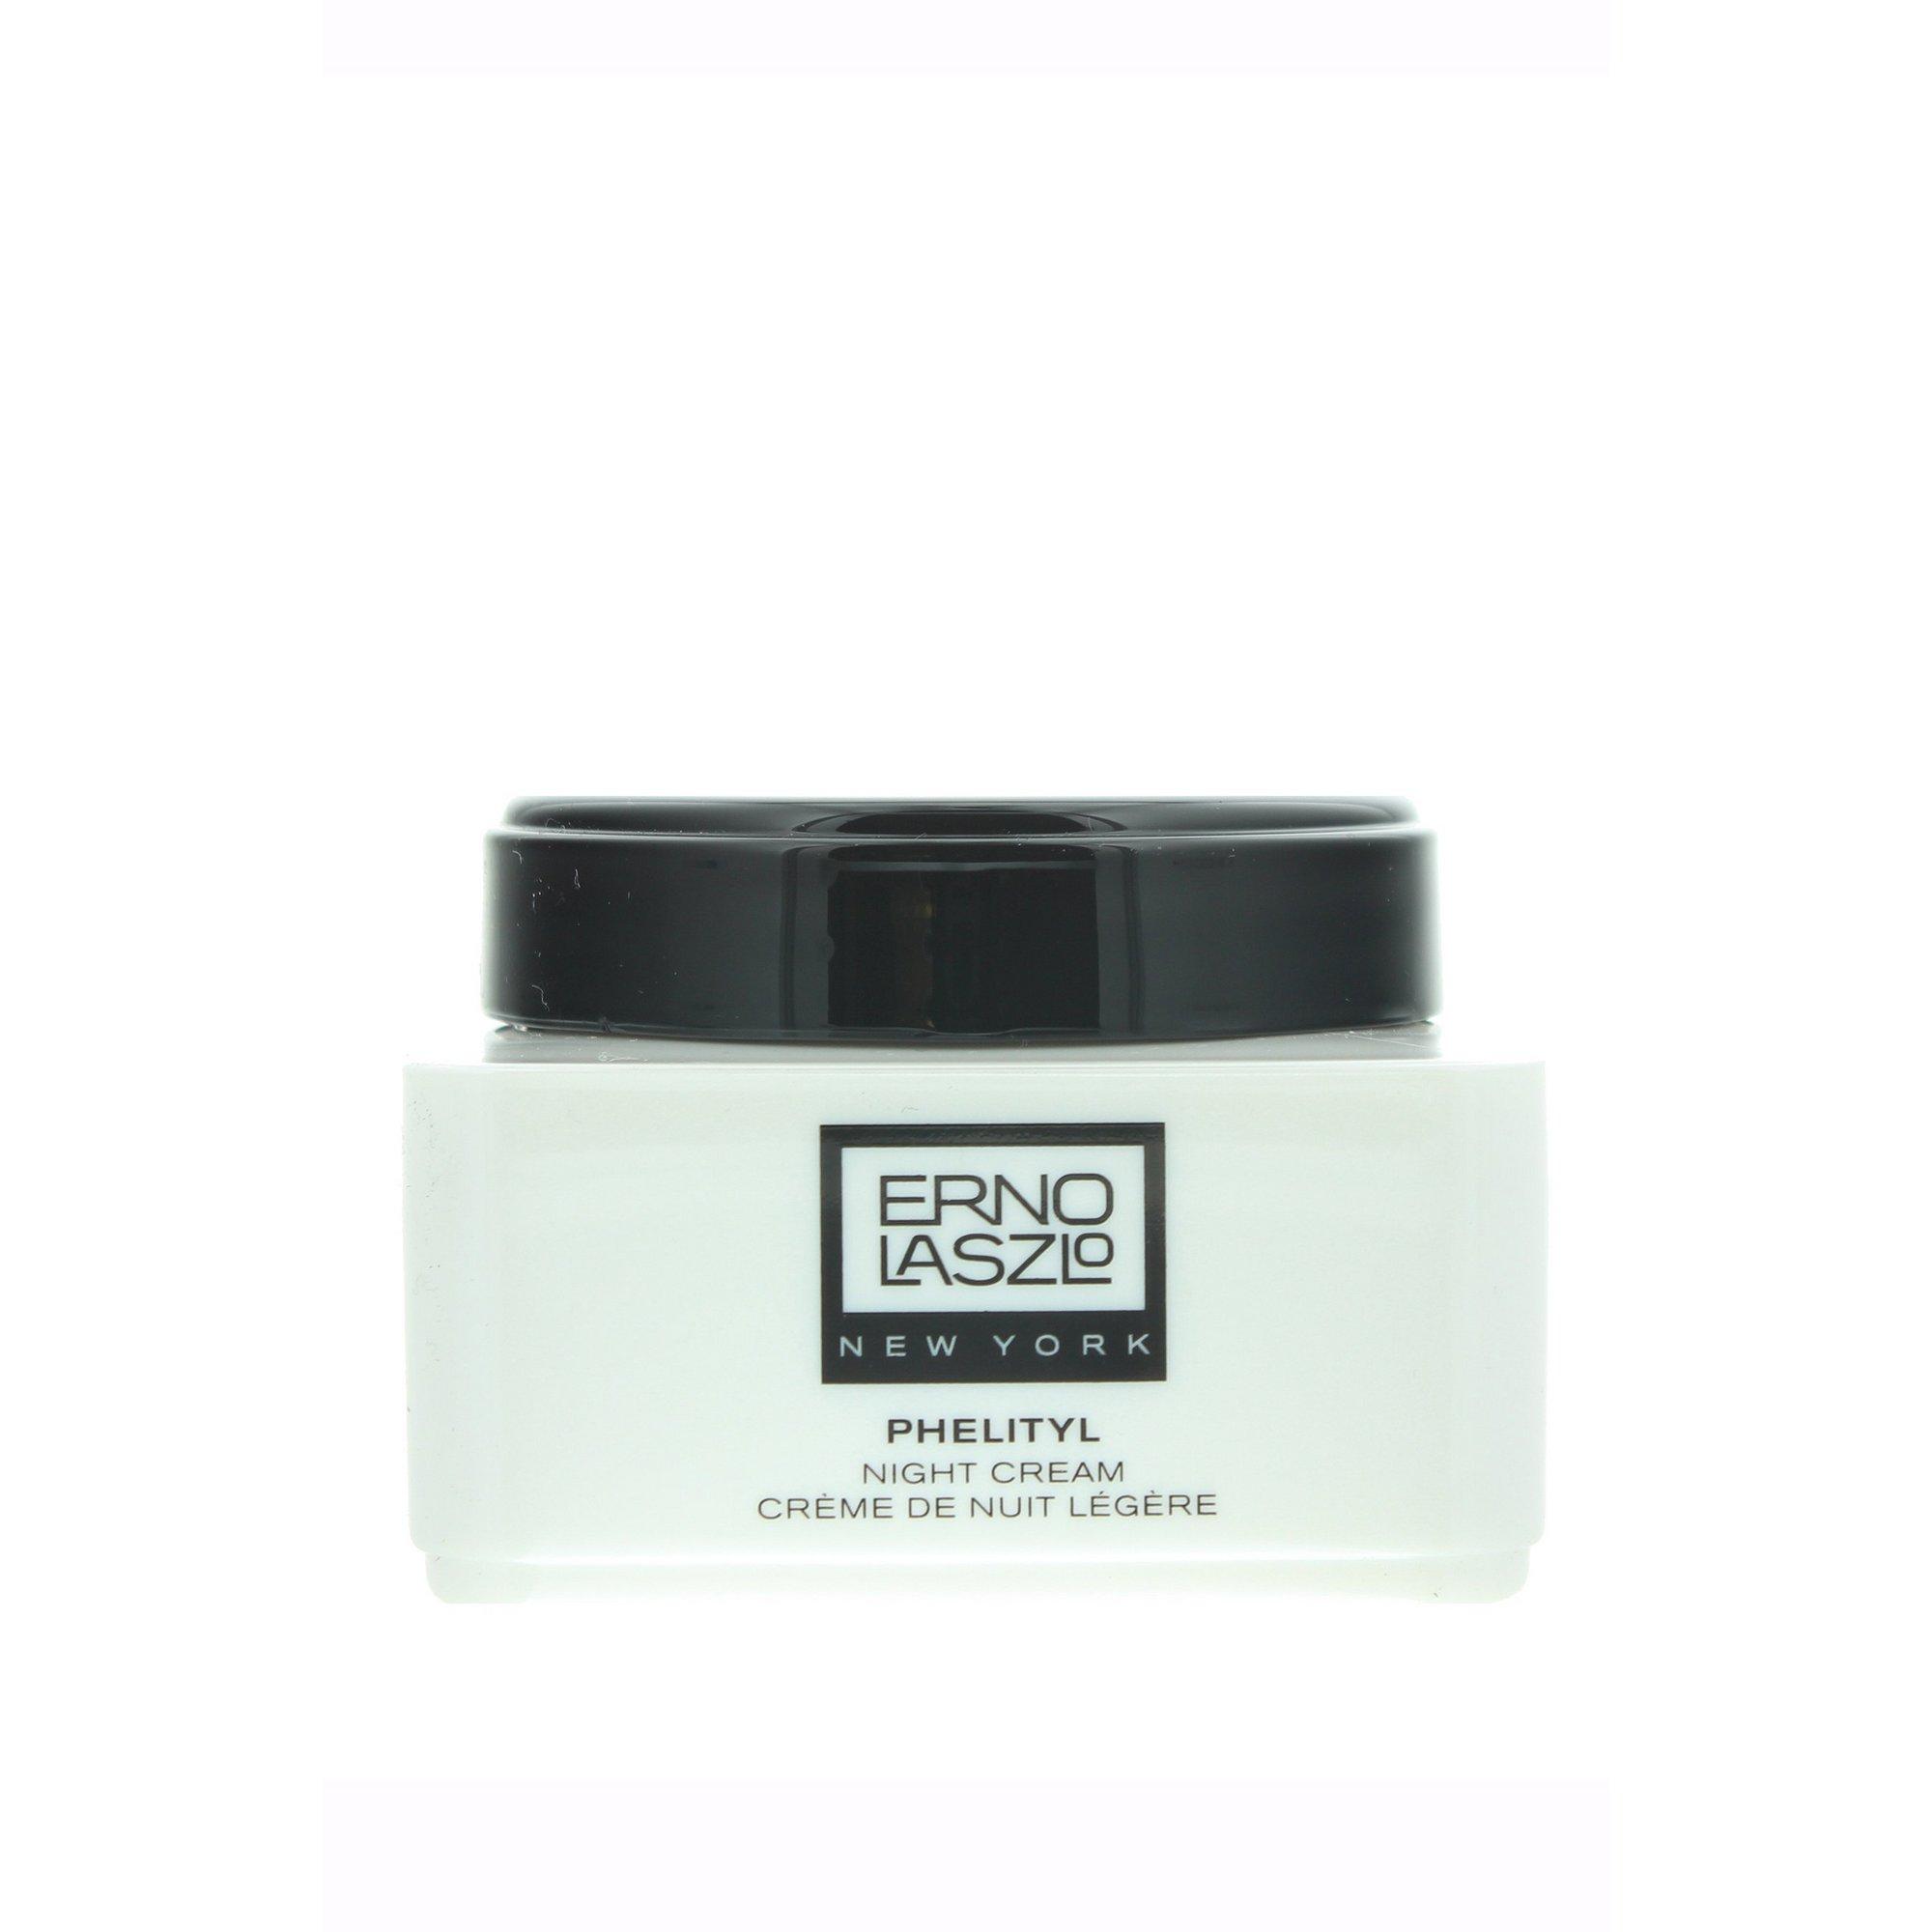 Image of Erno Laszlo Phelityl Night Cream